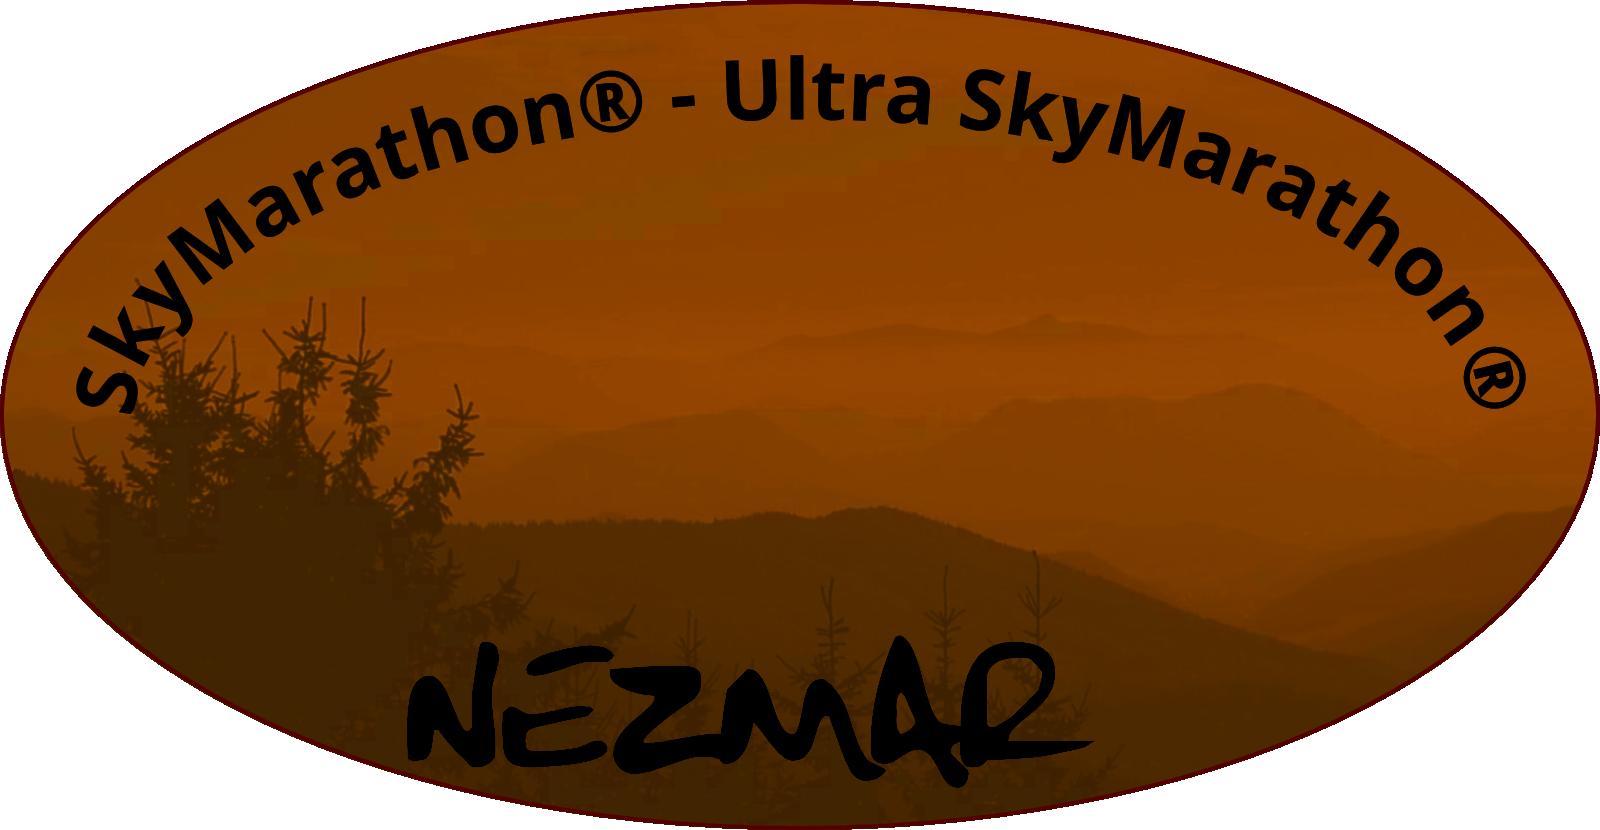 NEZMAR SkyMarathon® a Ultra SkyMarathon®